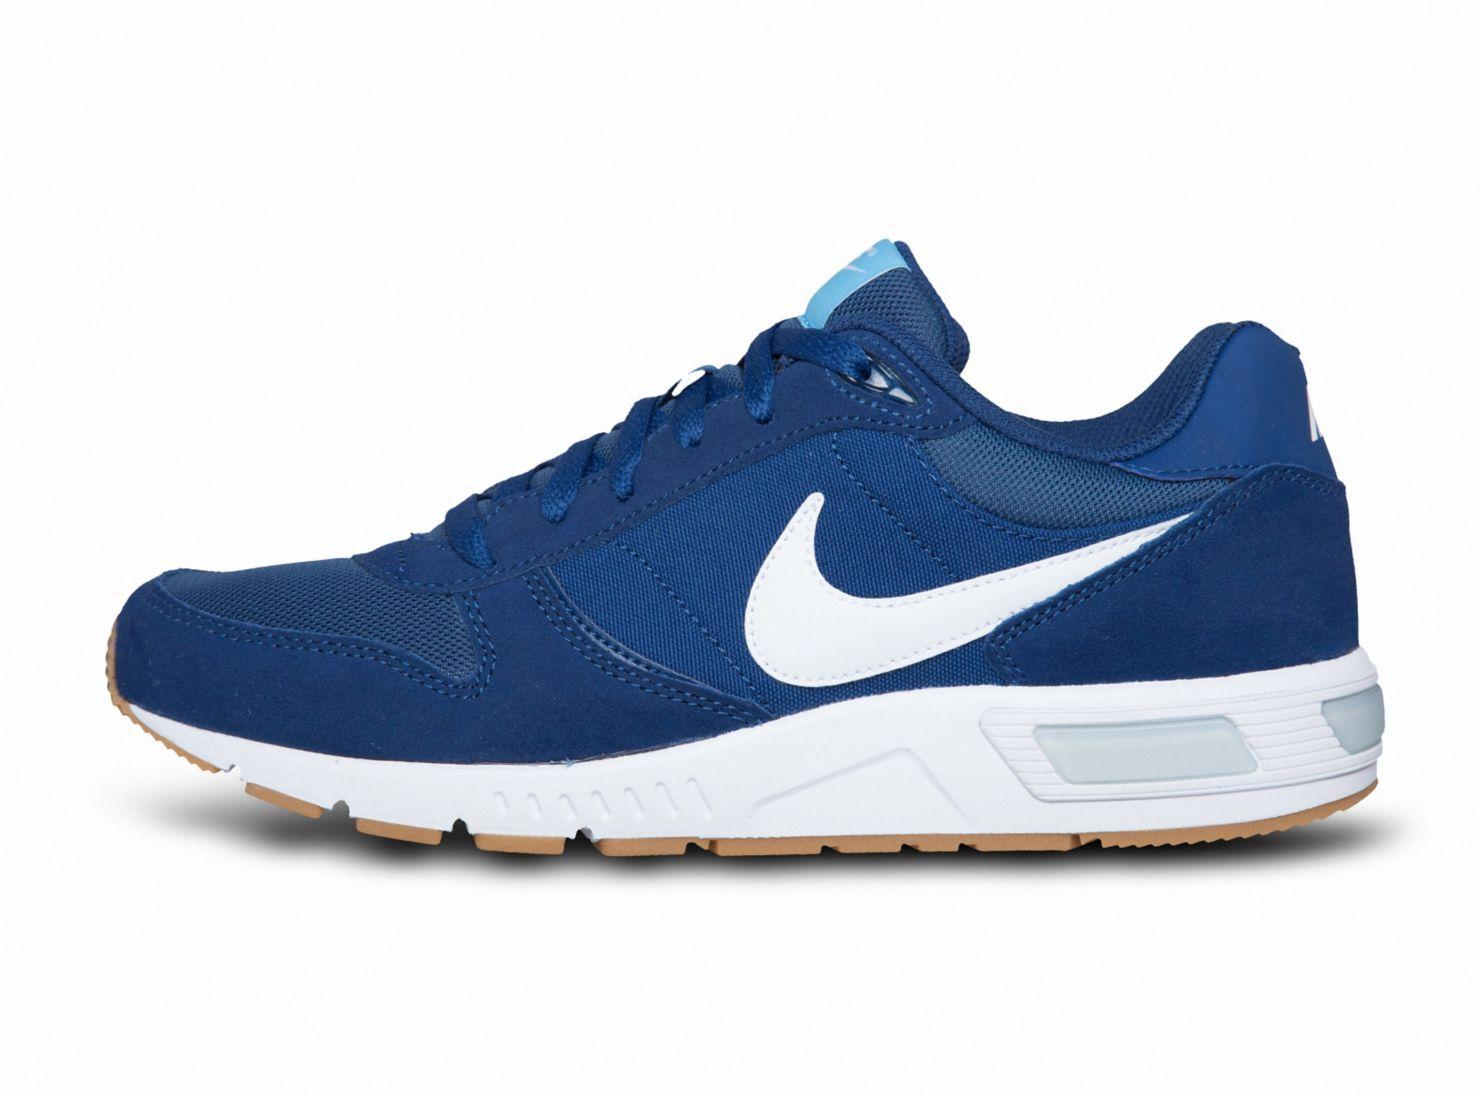 9f639223c Zapatilla Nike Nightgazer Urbana Hombre - Zapatillas